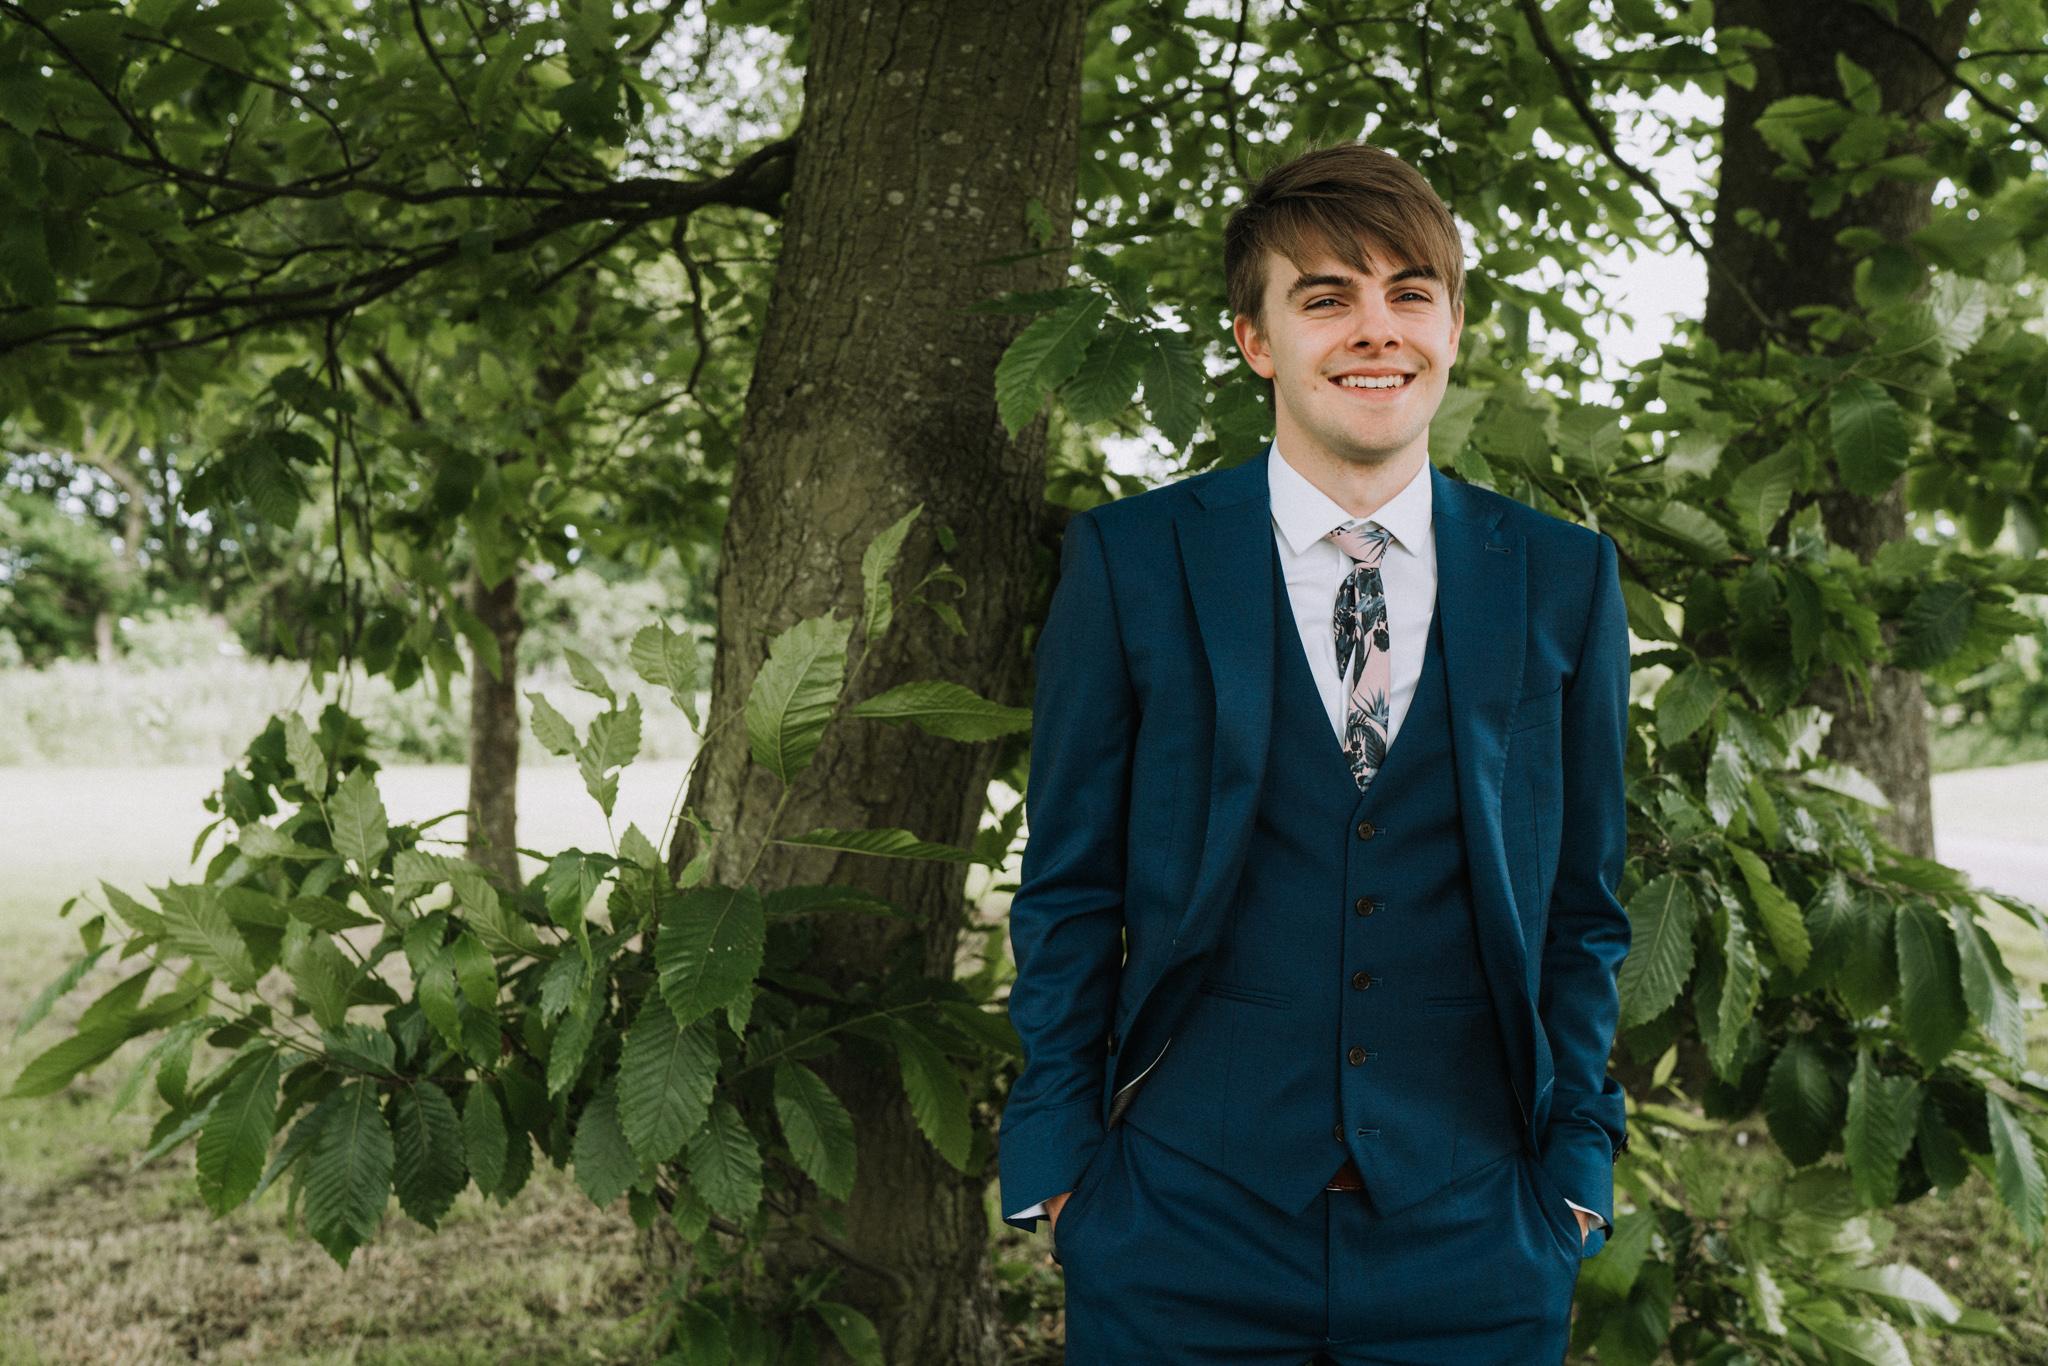 Jess-and-Tom-Norfolk-Alternative-Wedding-Essex-Wedding-Photographer-Grace-Elizabeth-2.jpg